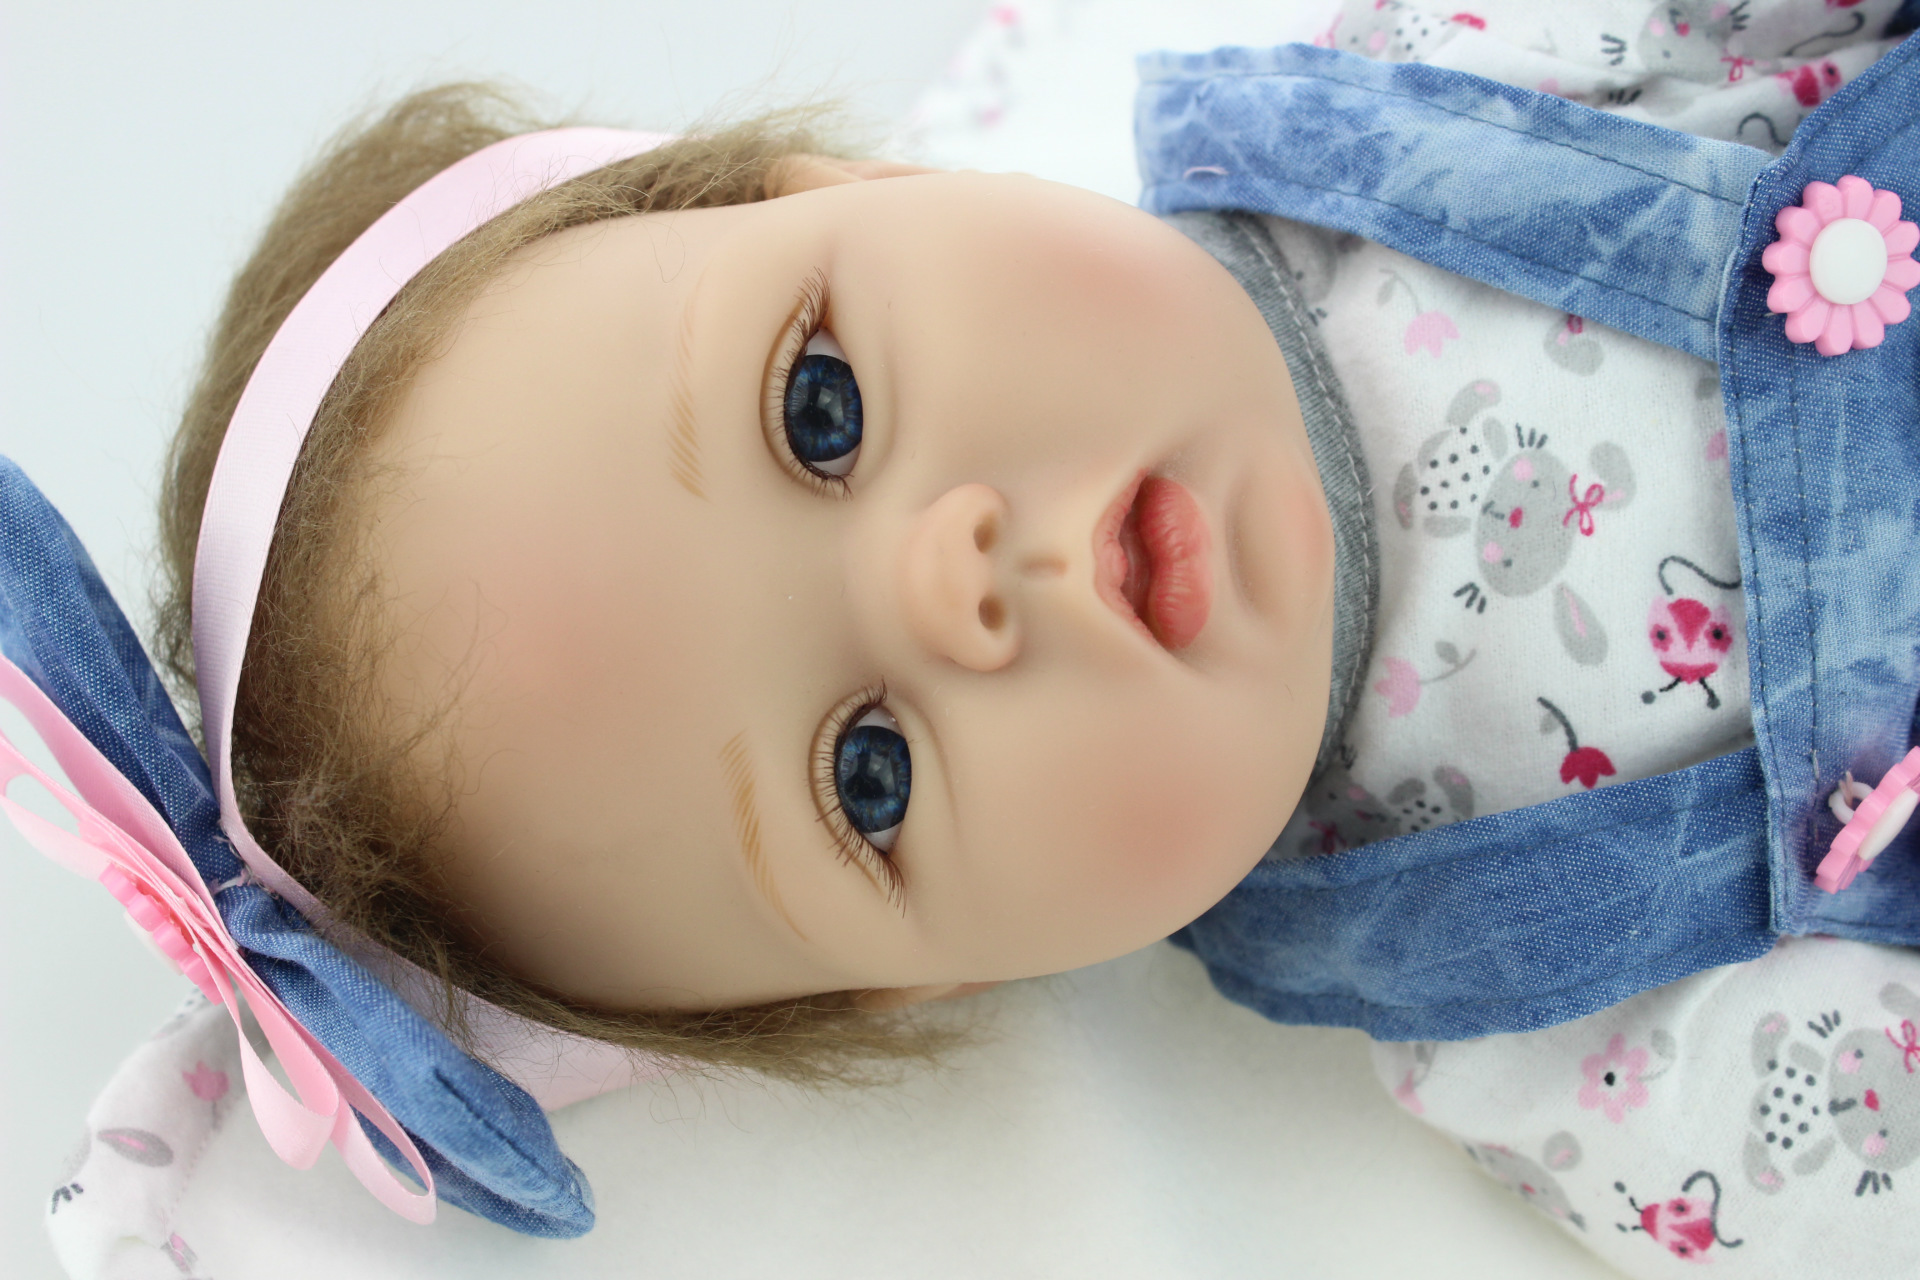 Reborn Toddler Girl High Quality Reborn Toddler Princess Girl Doll Silicone Vinyl Adorable Lifelike Baby Bonecas Girl Bebe Doll